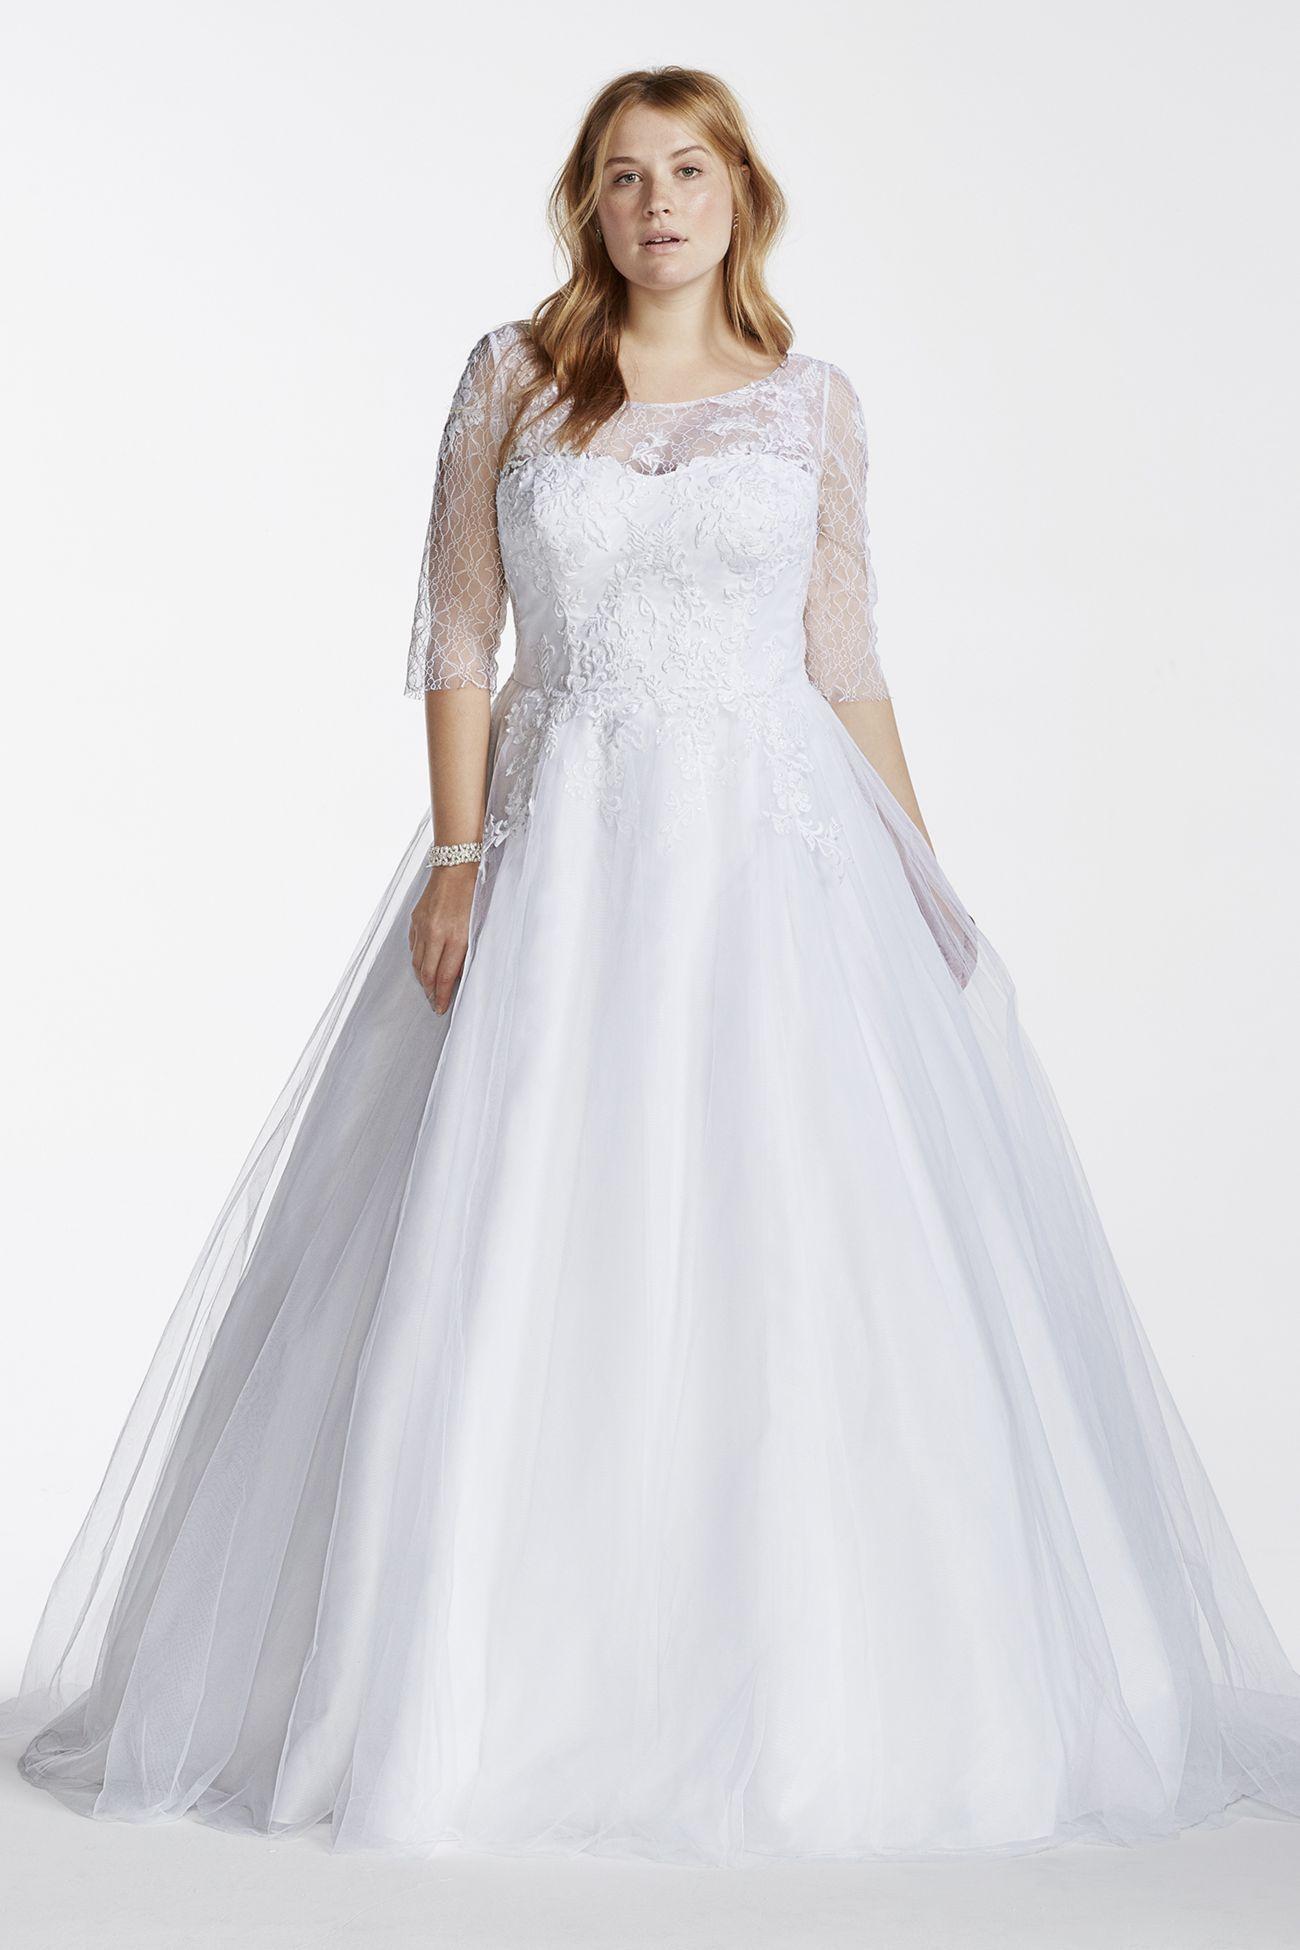 9WG3742 Davids bridal 599 Wedding dresses, Plus size